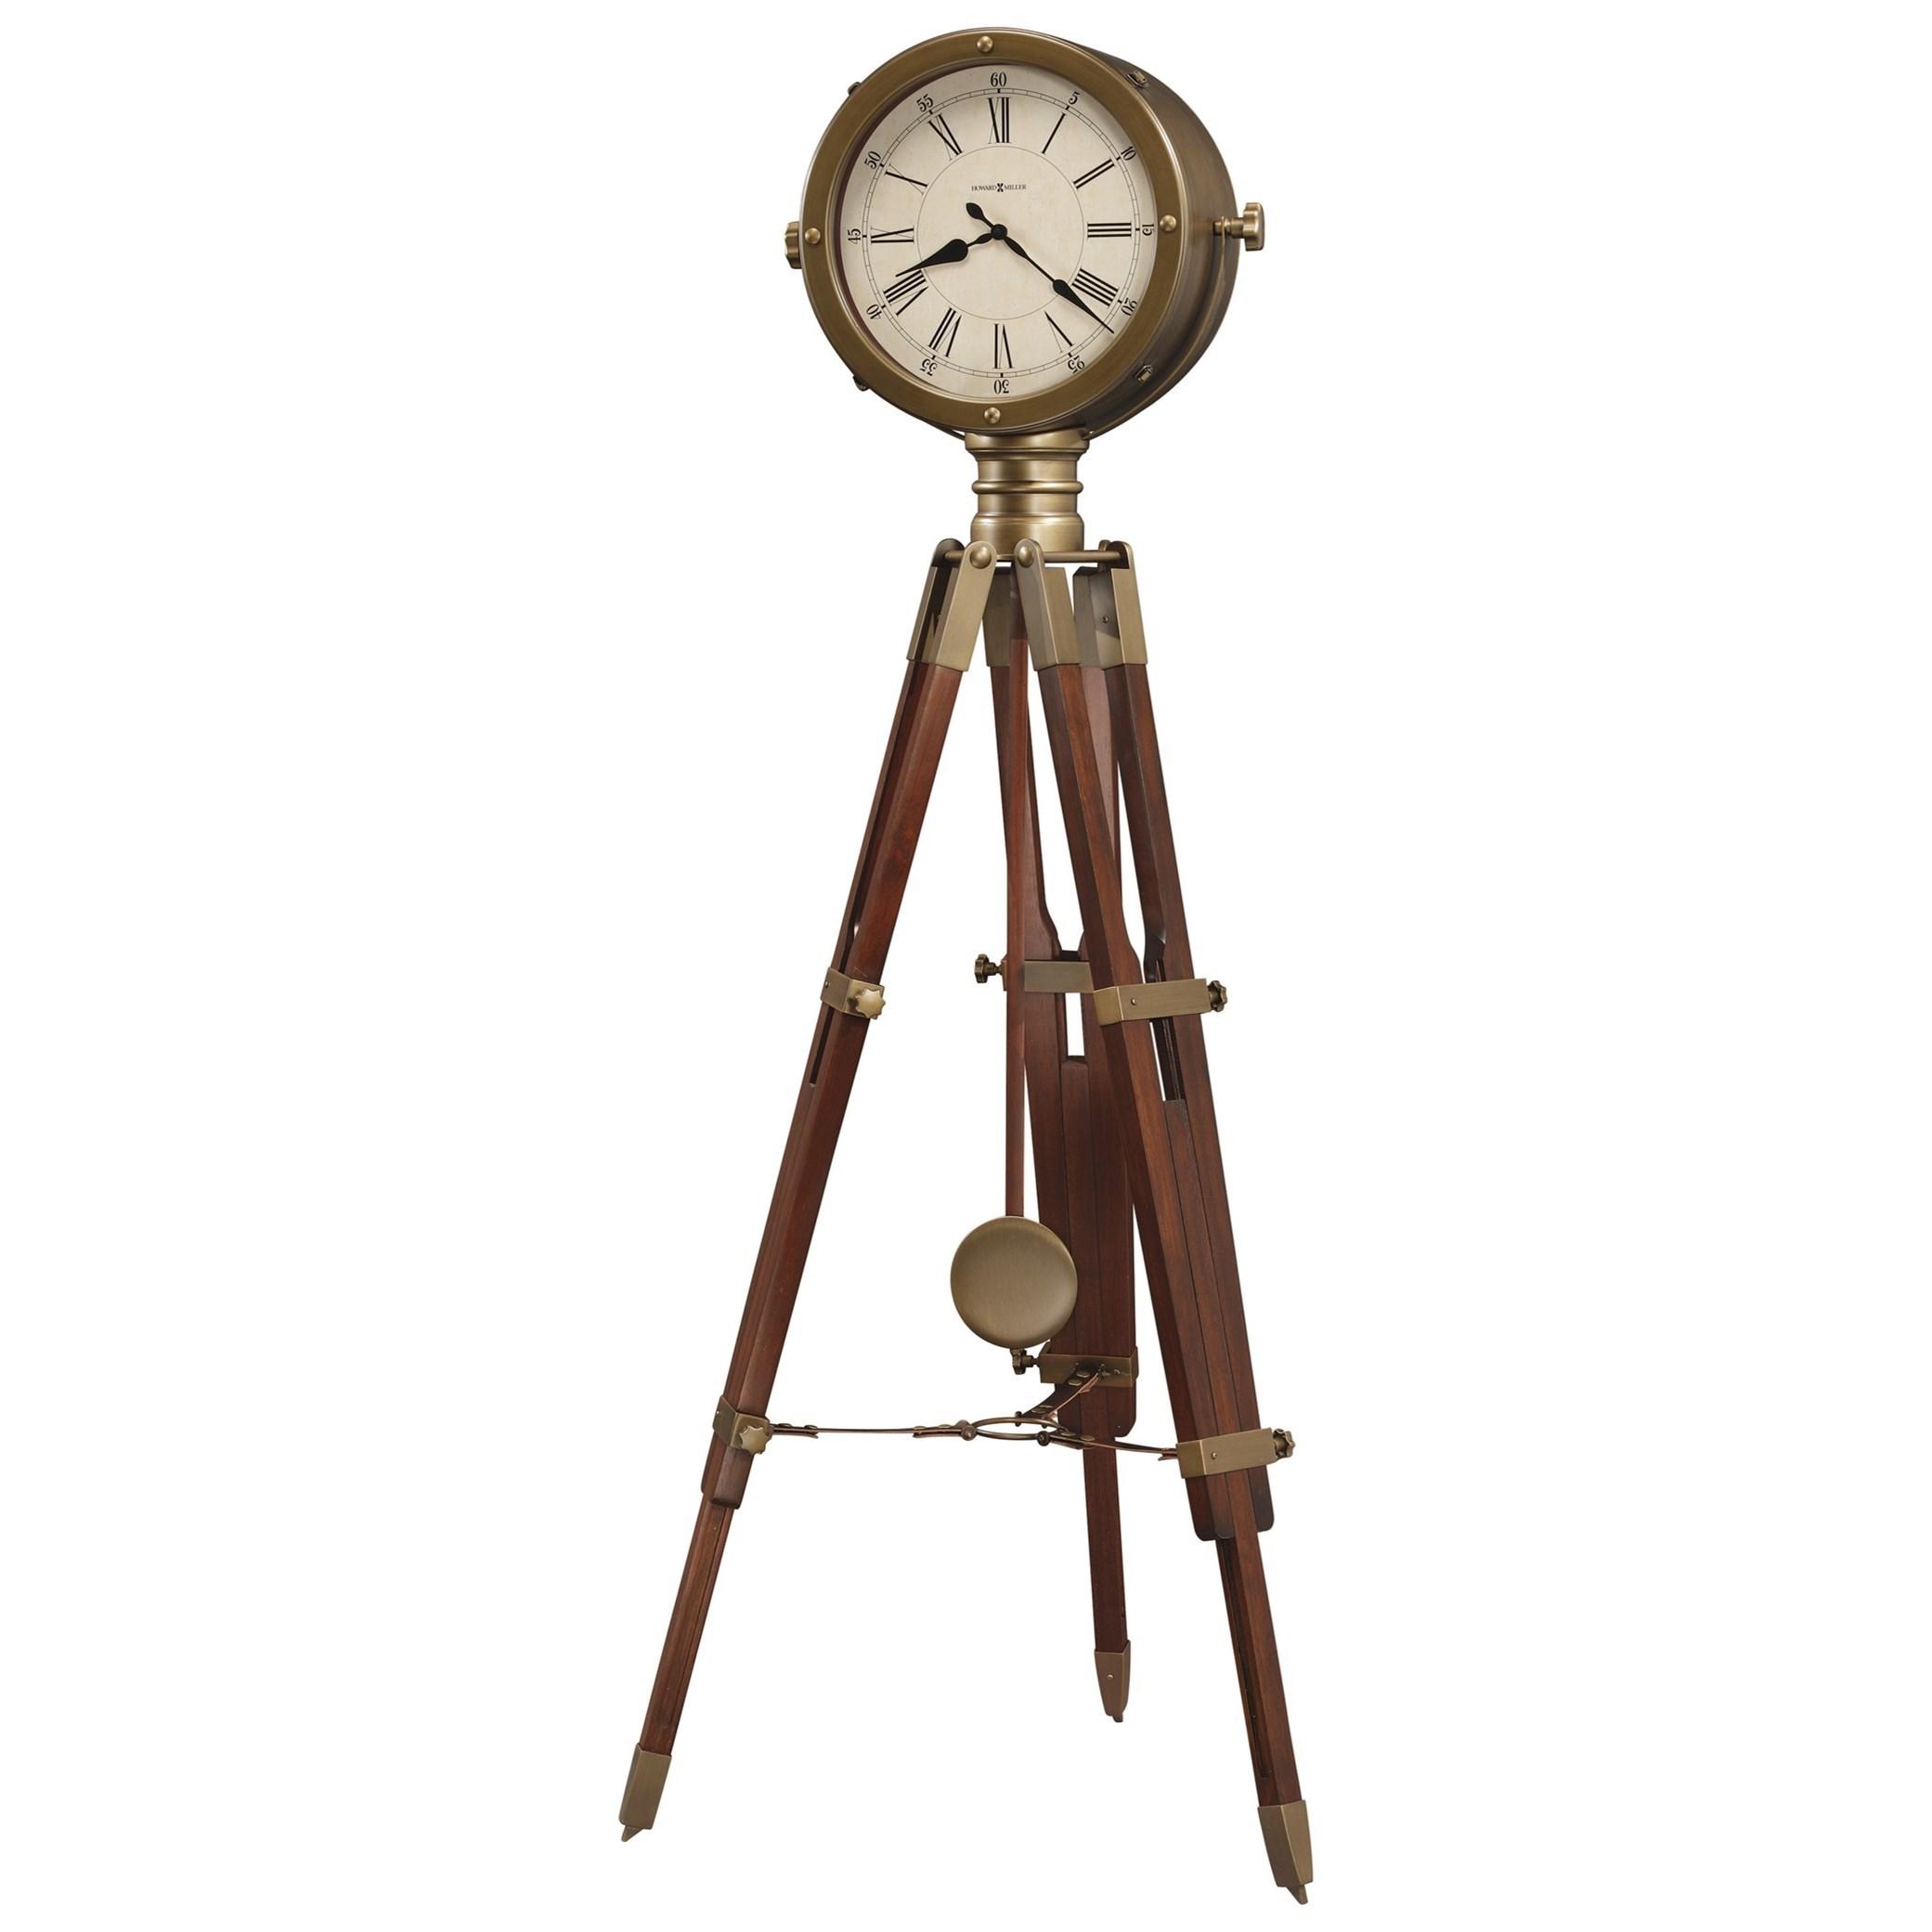 Howard Miller Clocks Time Surveyor Floor Clock - Item Number: 615-080